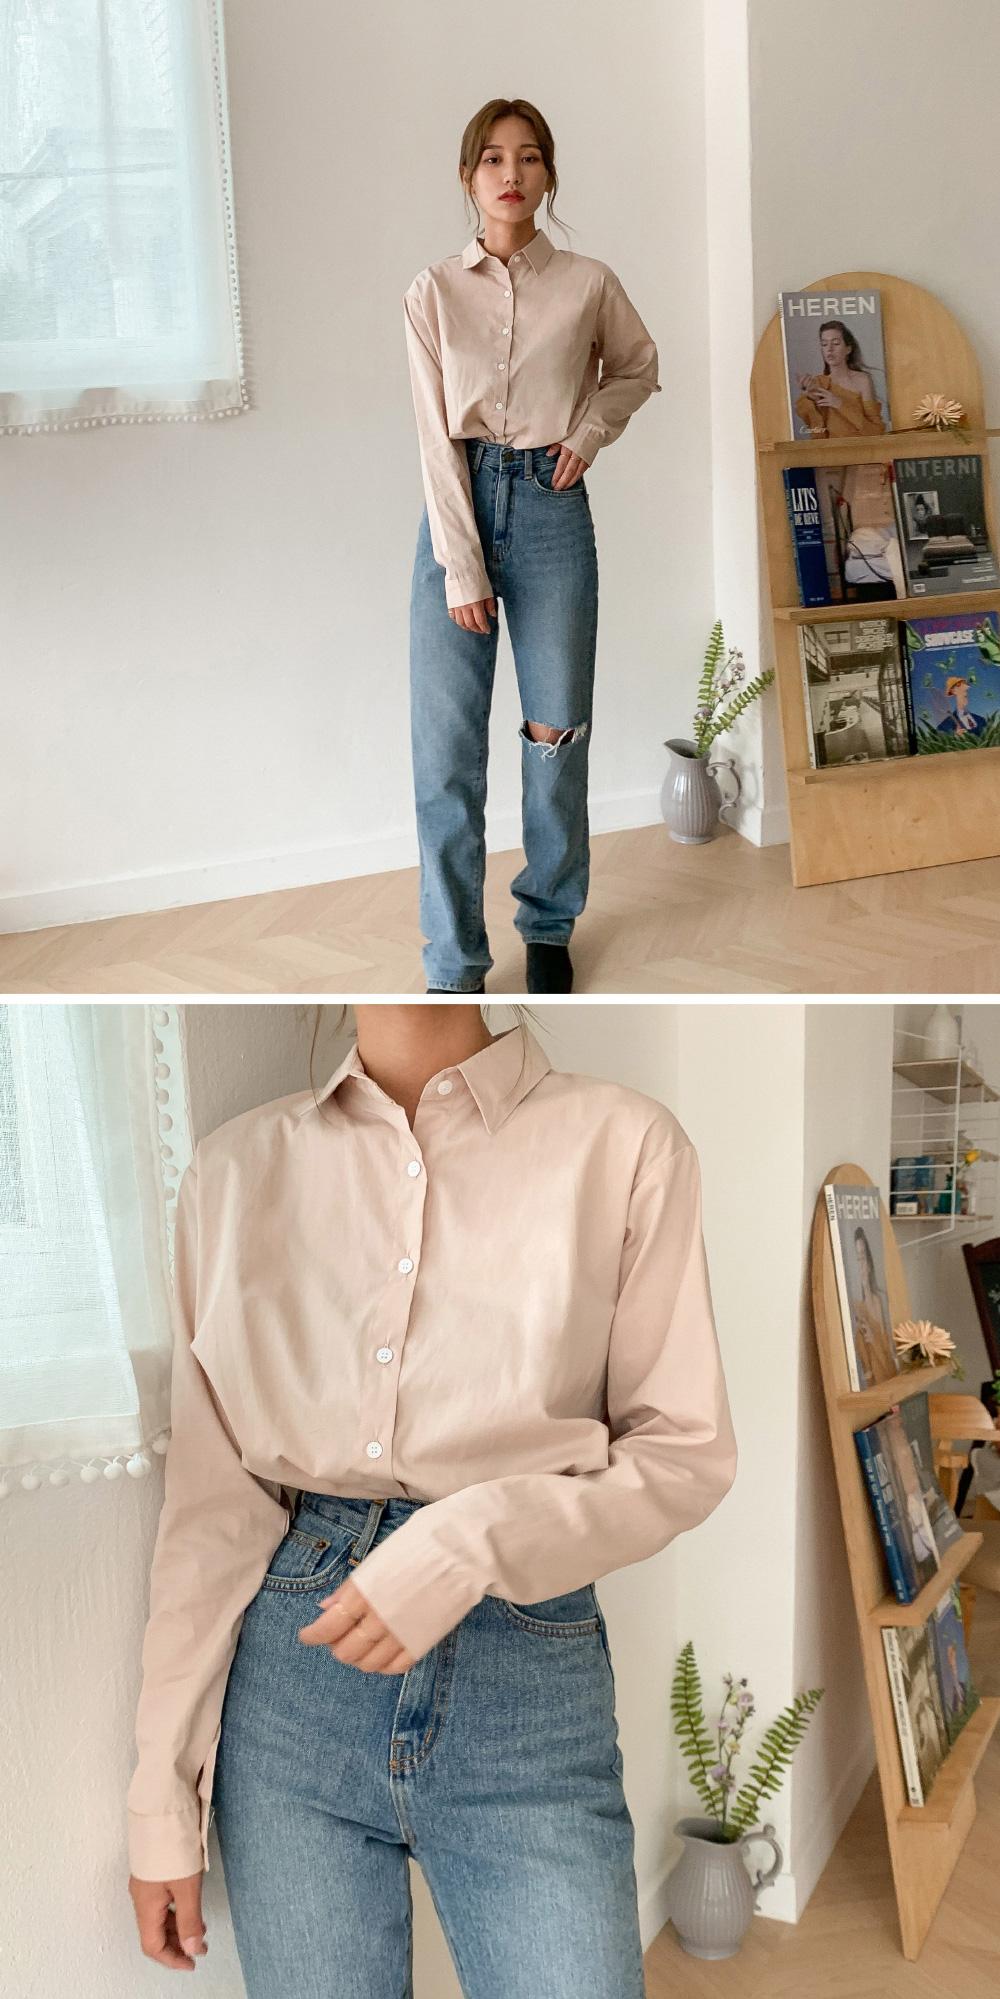 Simple Cutting Damage Date Jeans